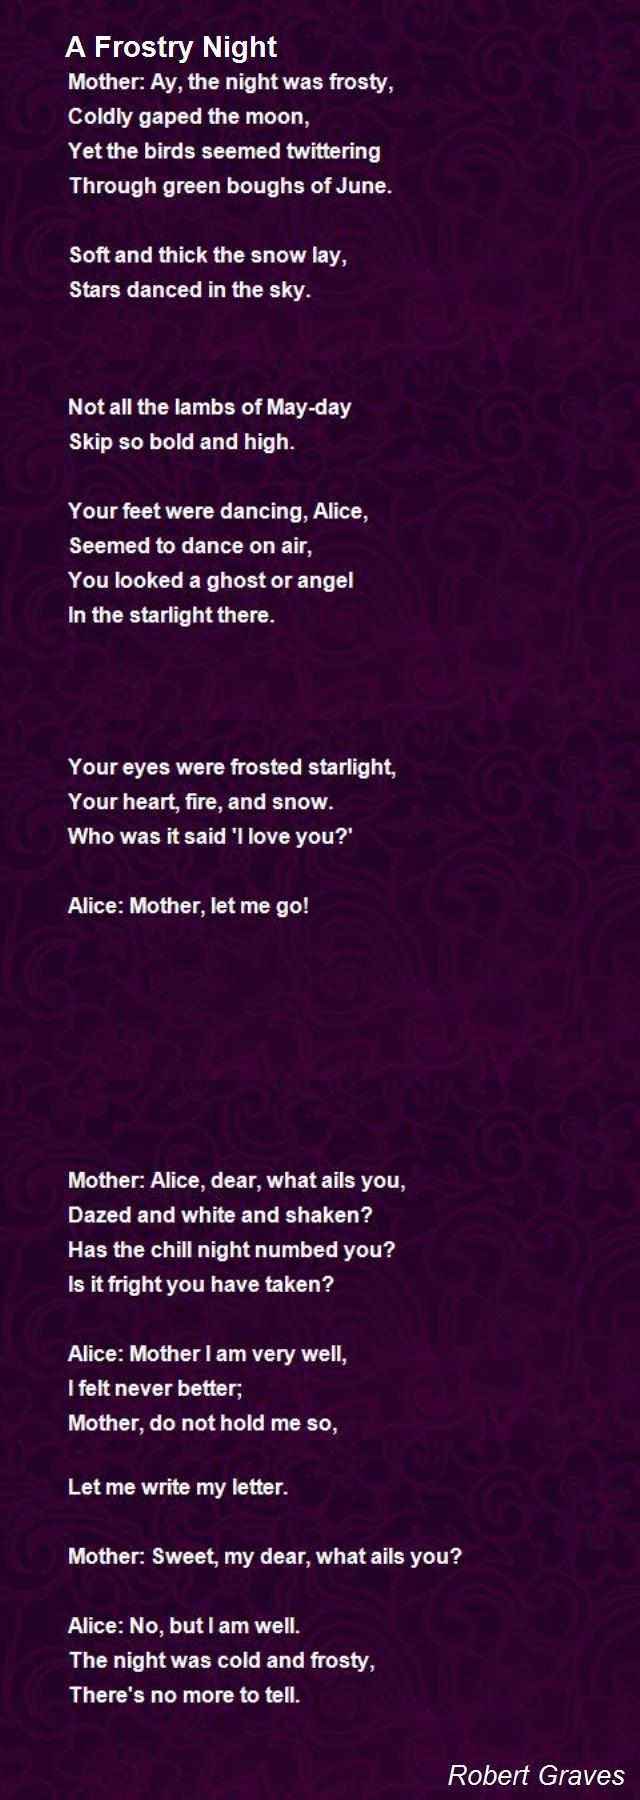 A Frosty Night Poem by Robert Graves - Poem Hunter